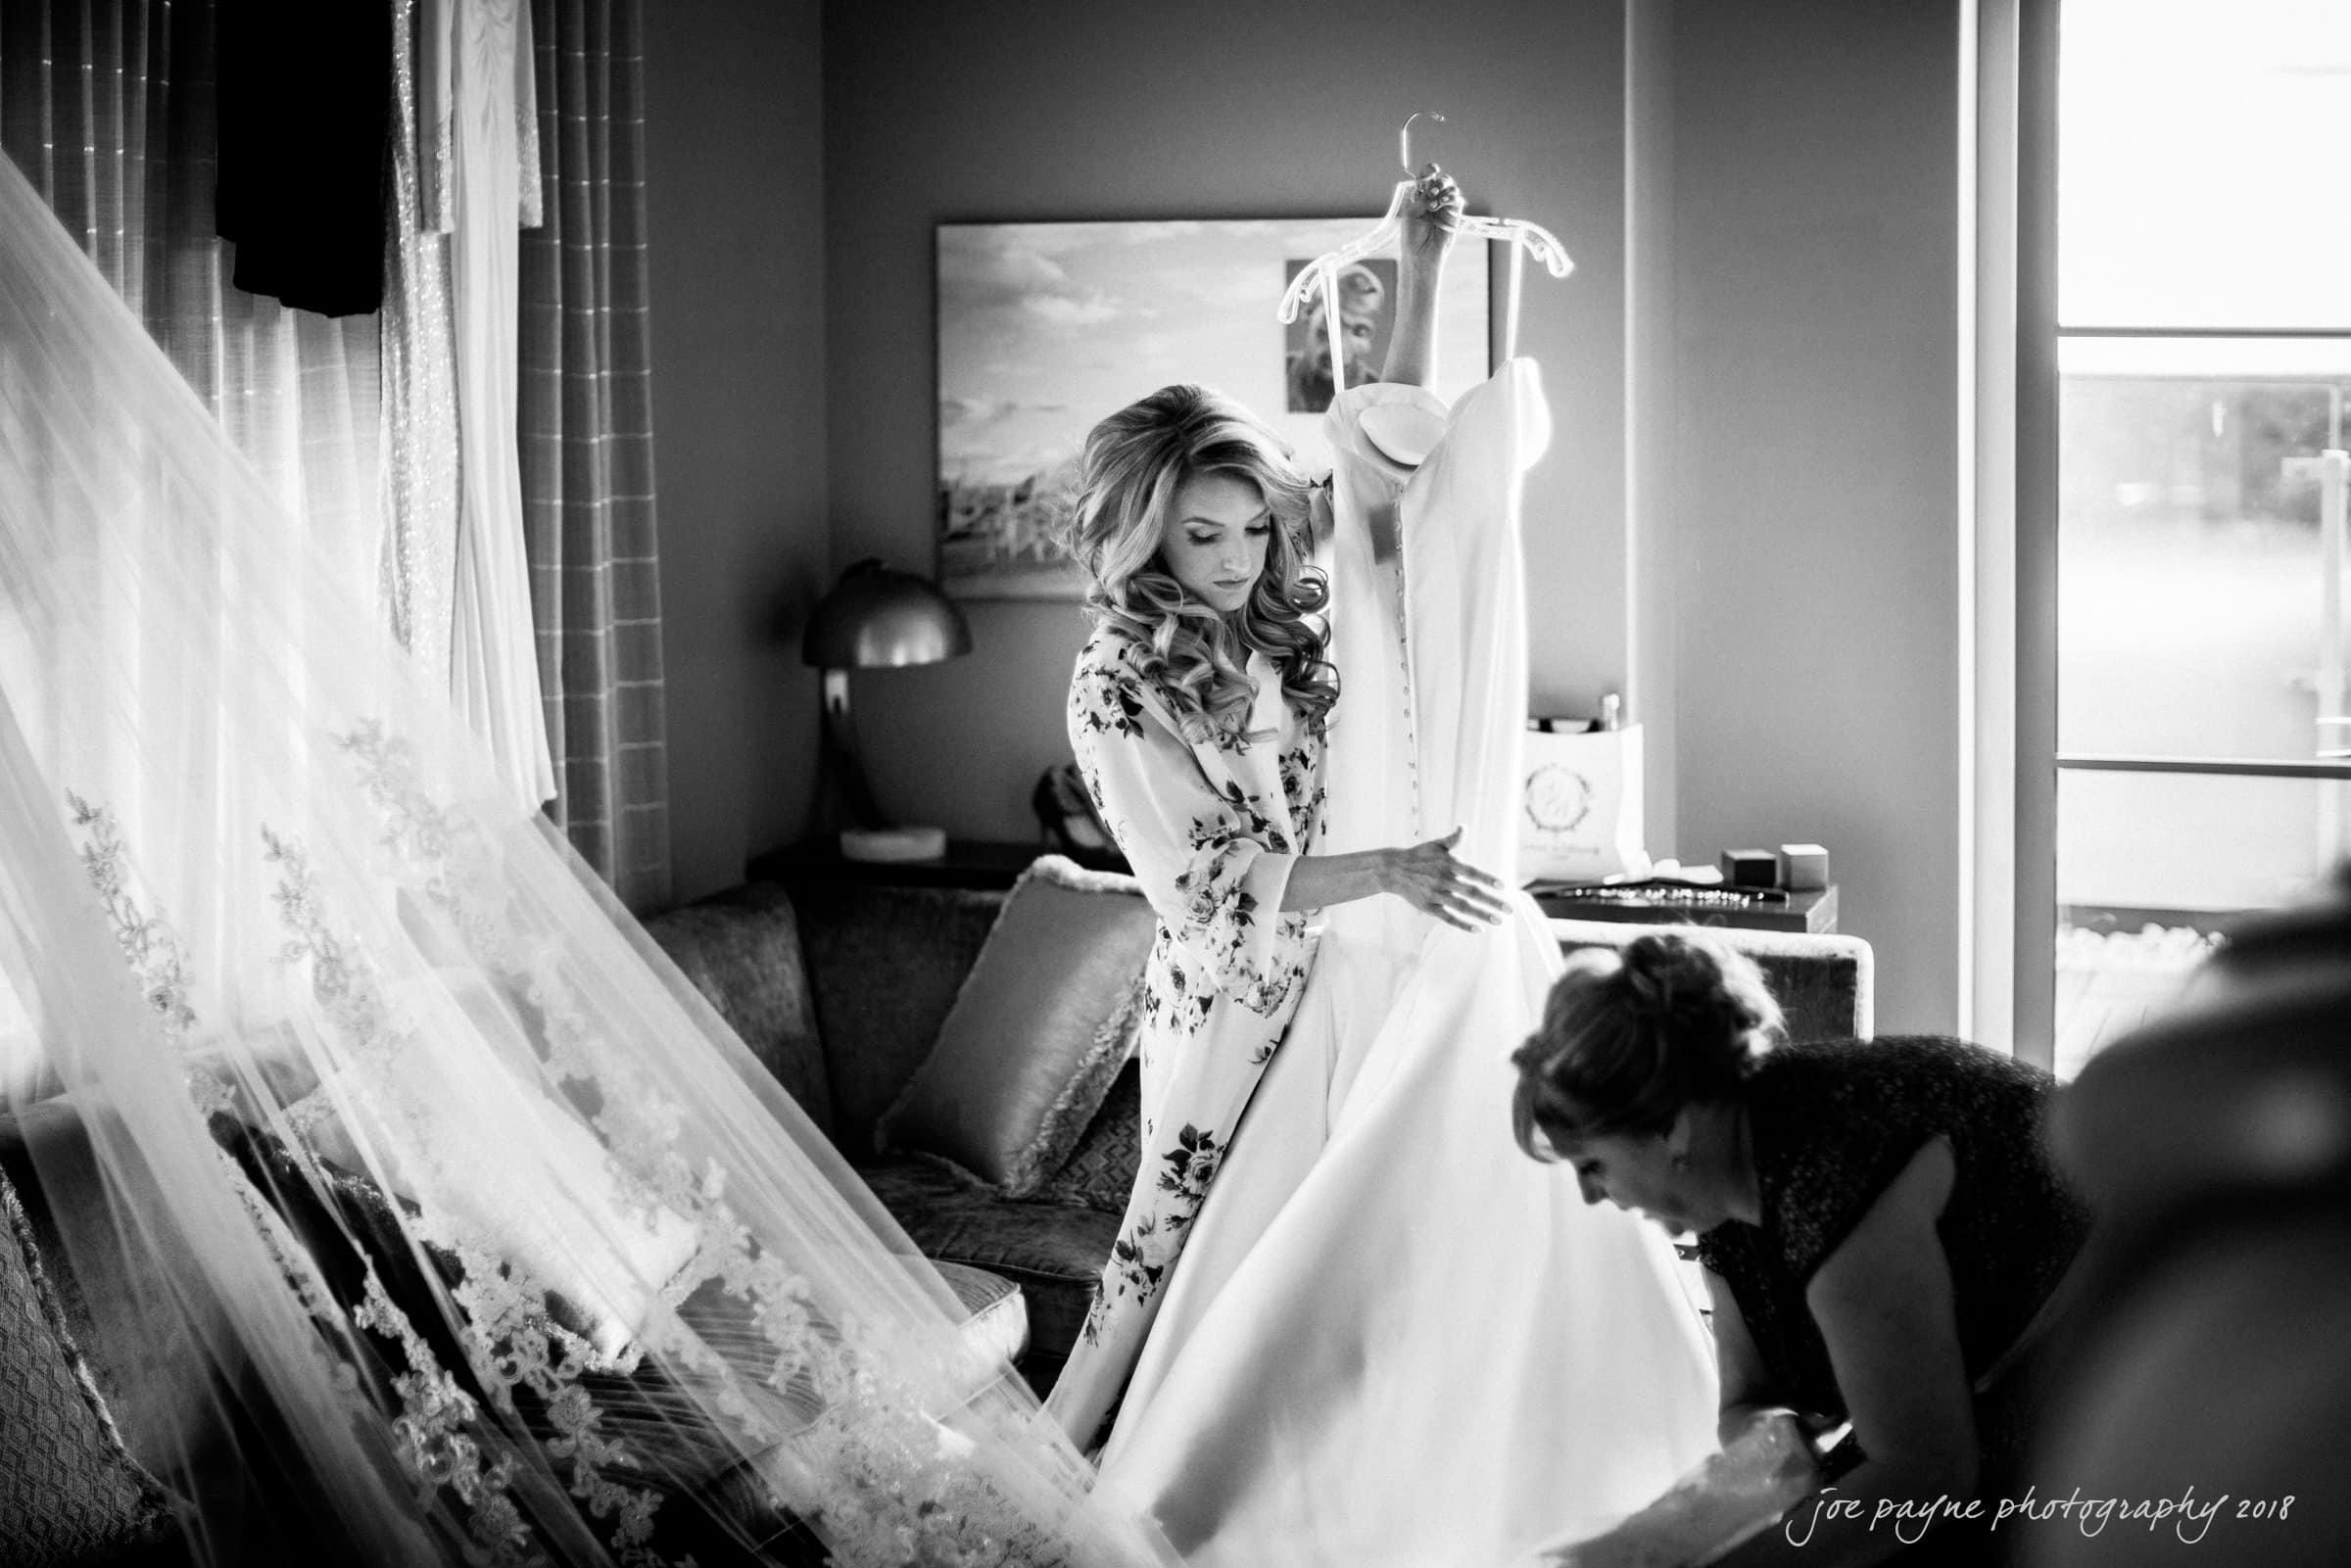 21c, duke chapel & cookery wedding photography – brandy & gabe